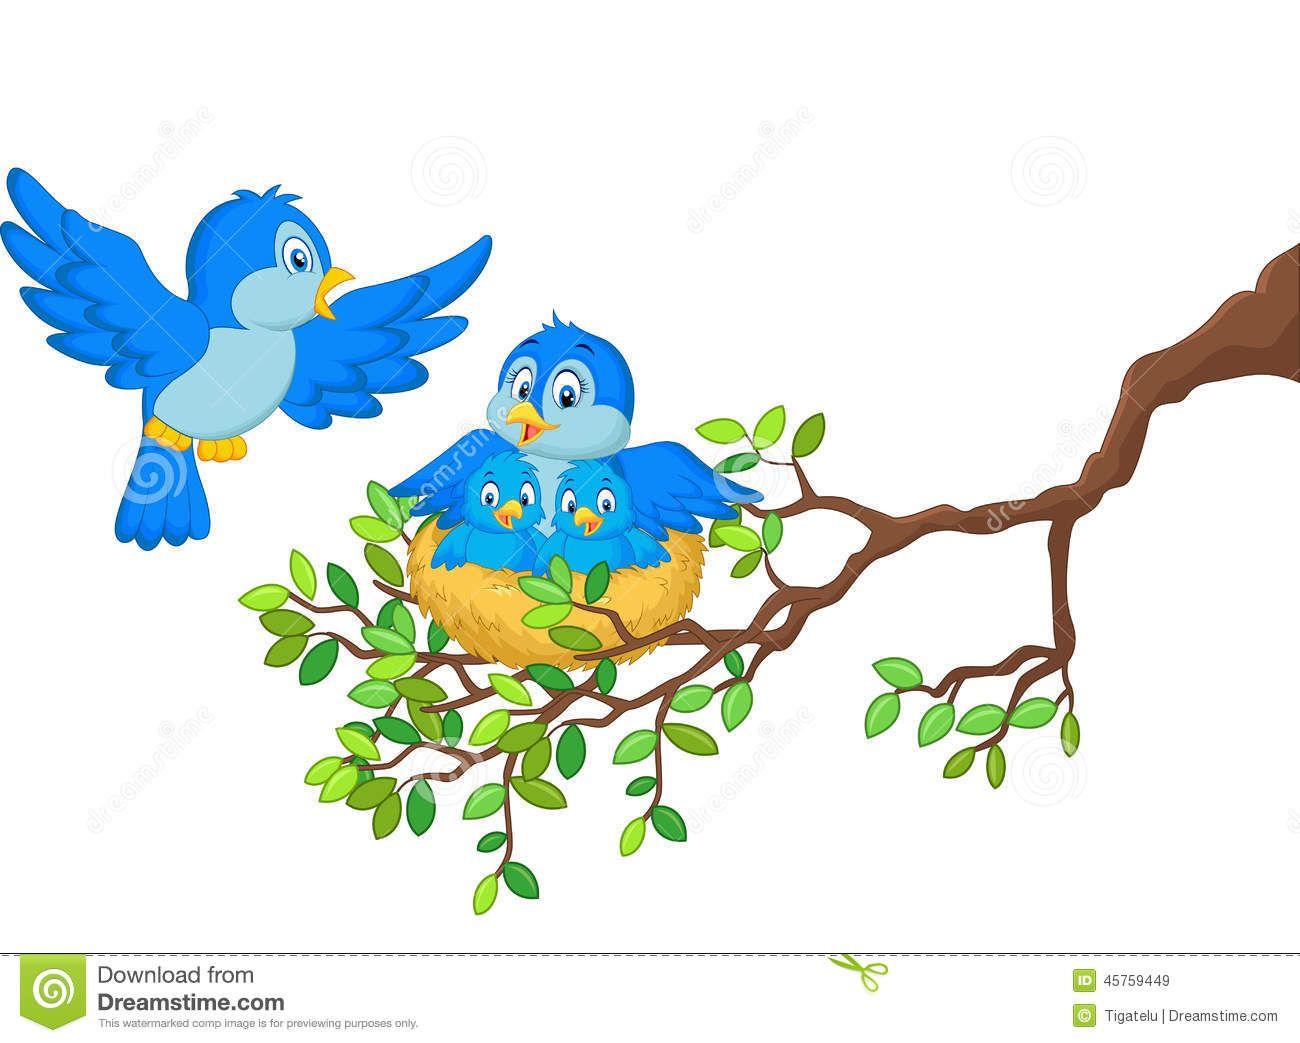 Cartoon stock photos images. Nest clipart blue bird